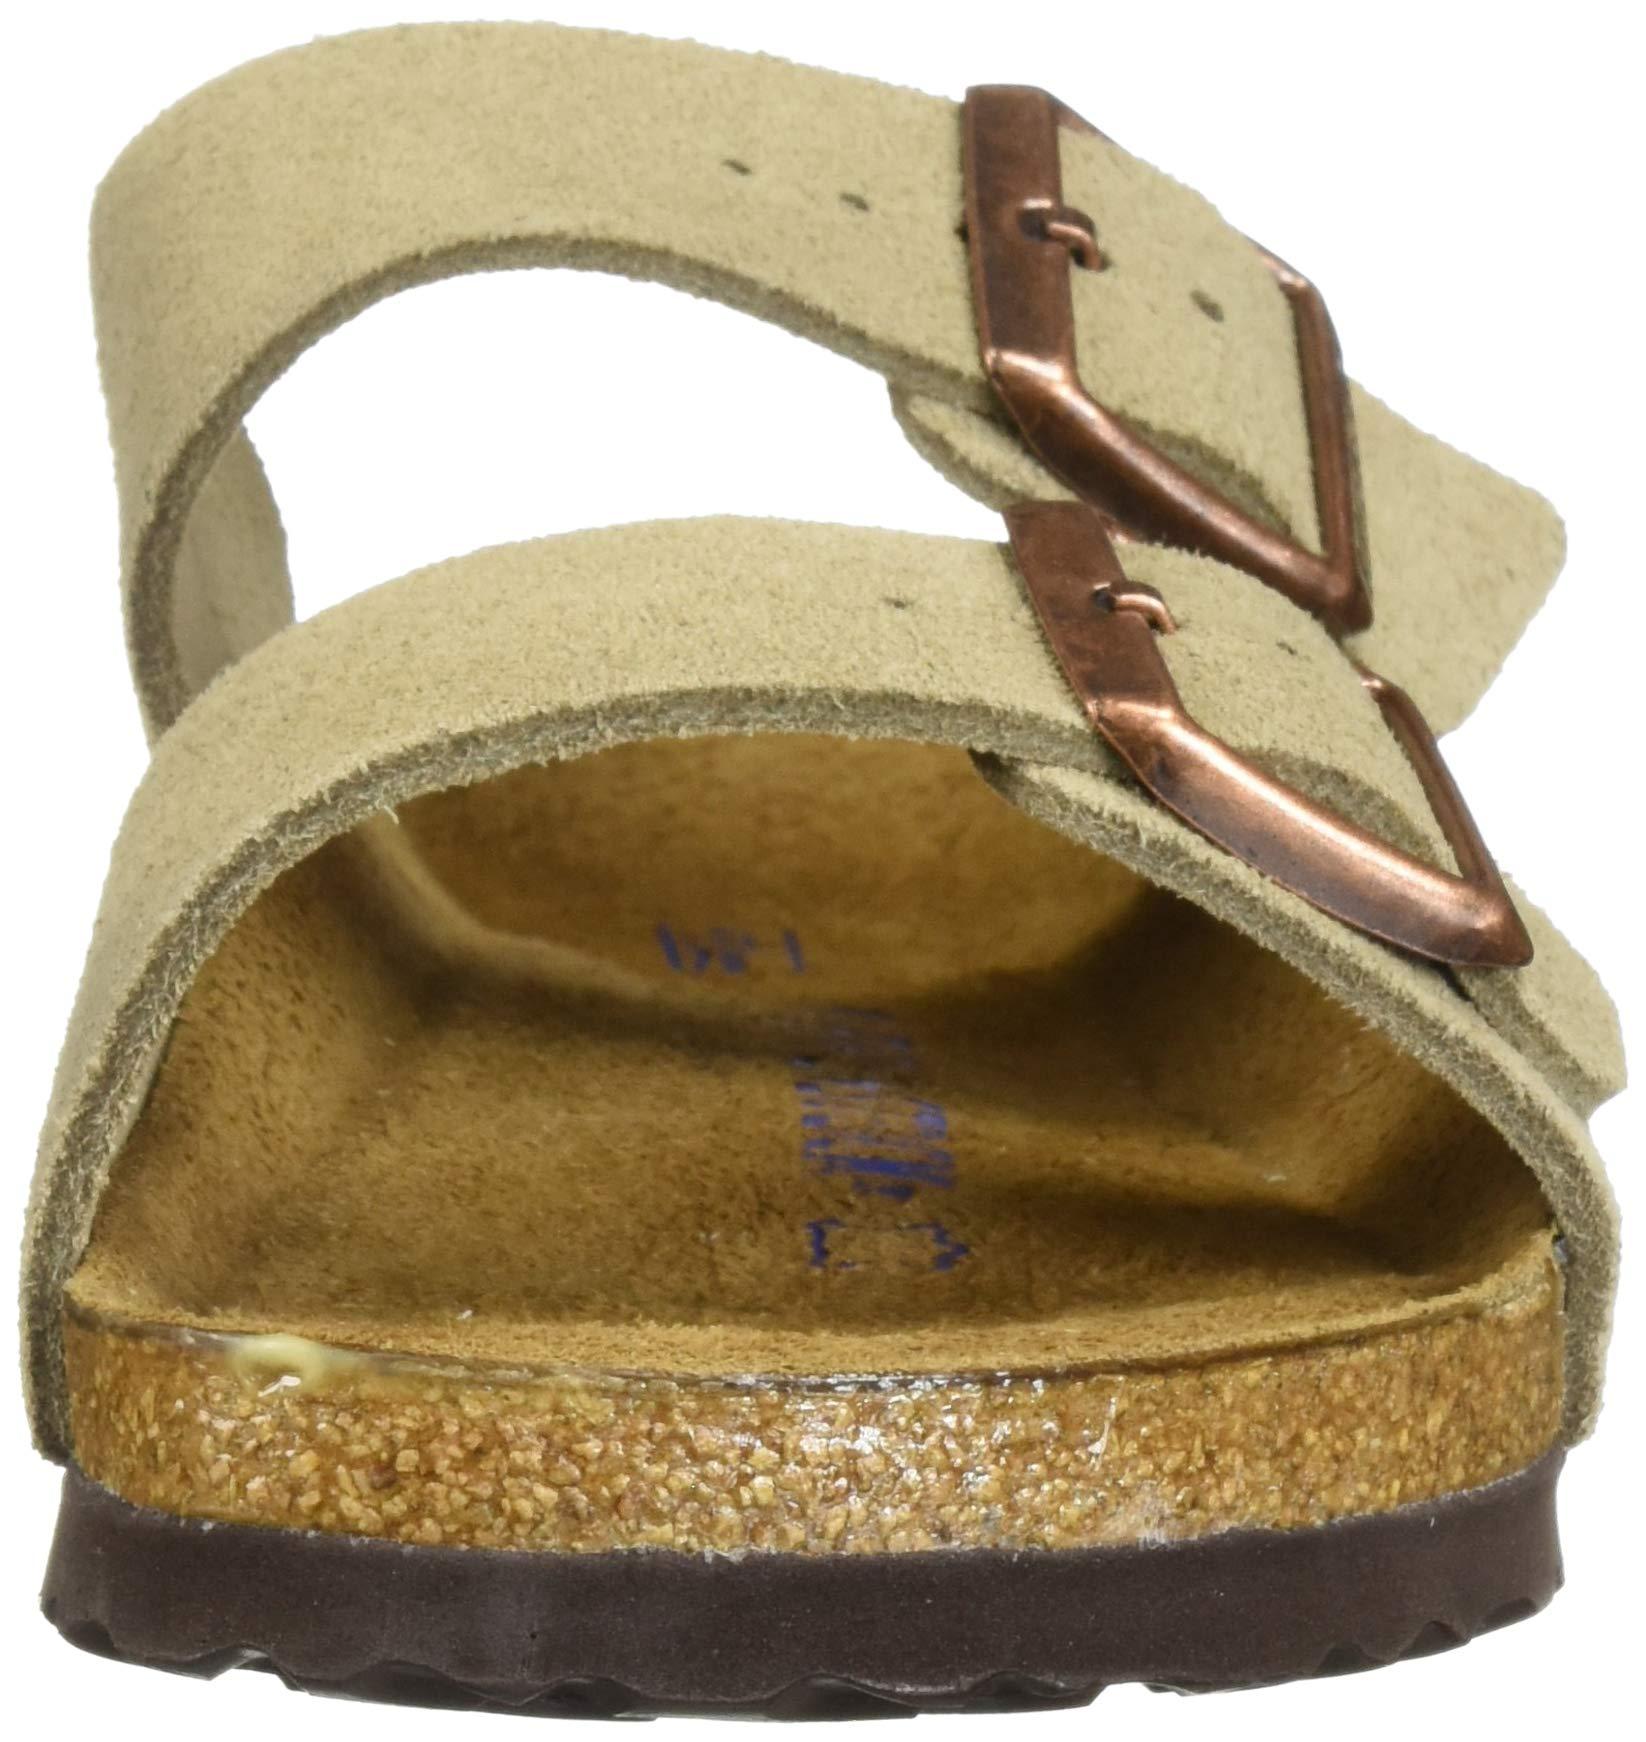 Birkenstock Arizona Soft Footbed Taupe Suede Regular Width - EU Size 35 / Women's US Sizes 4-4.5 by Birkenstock (Image #4)